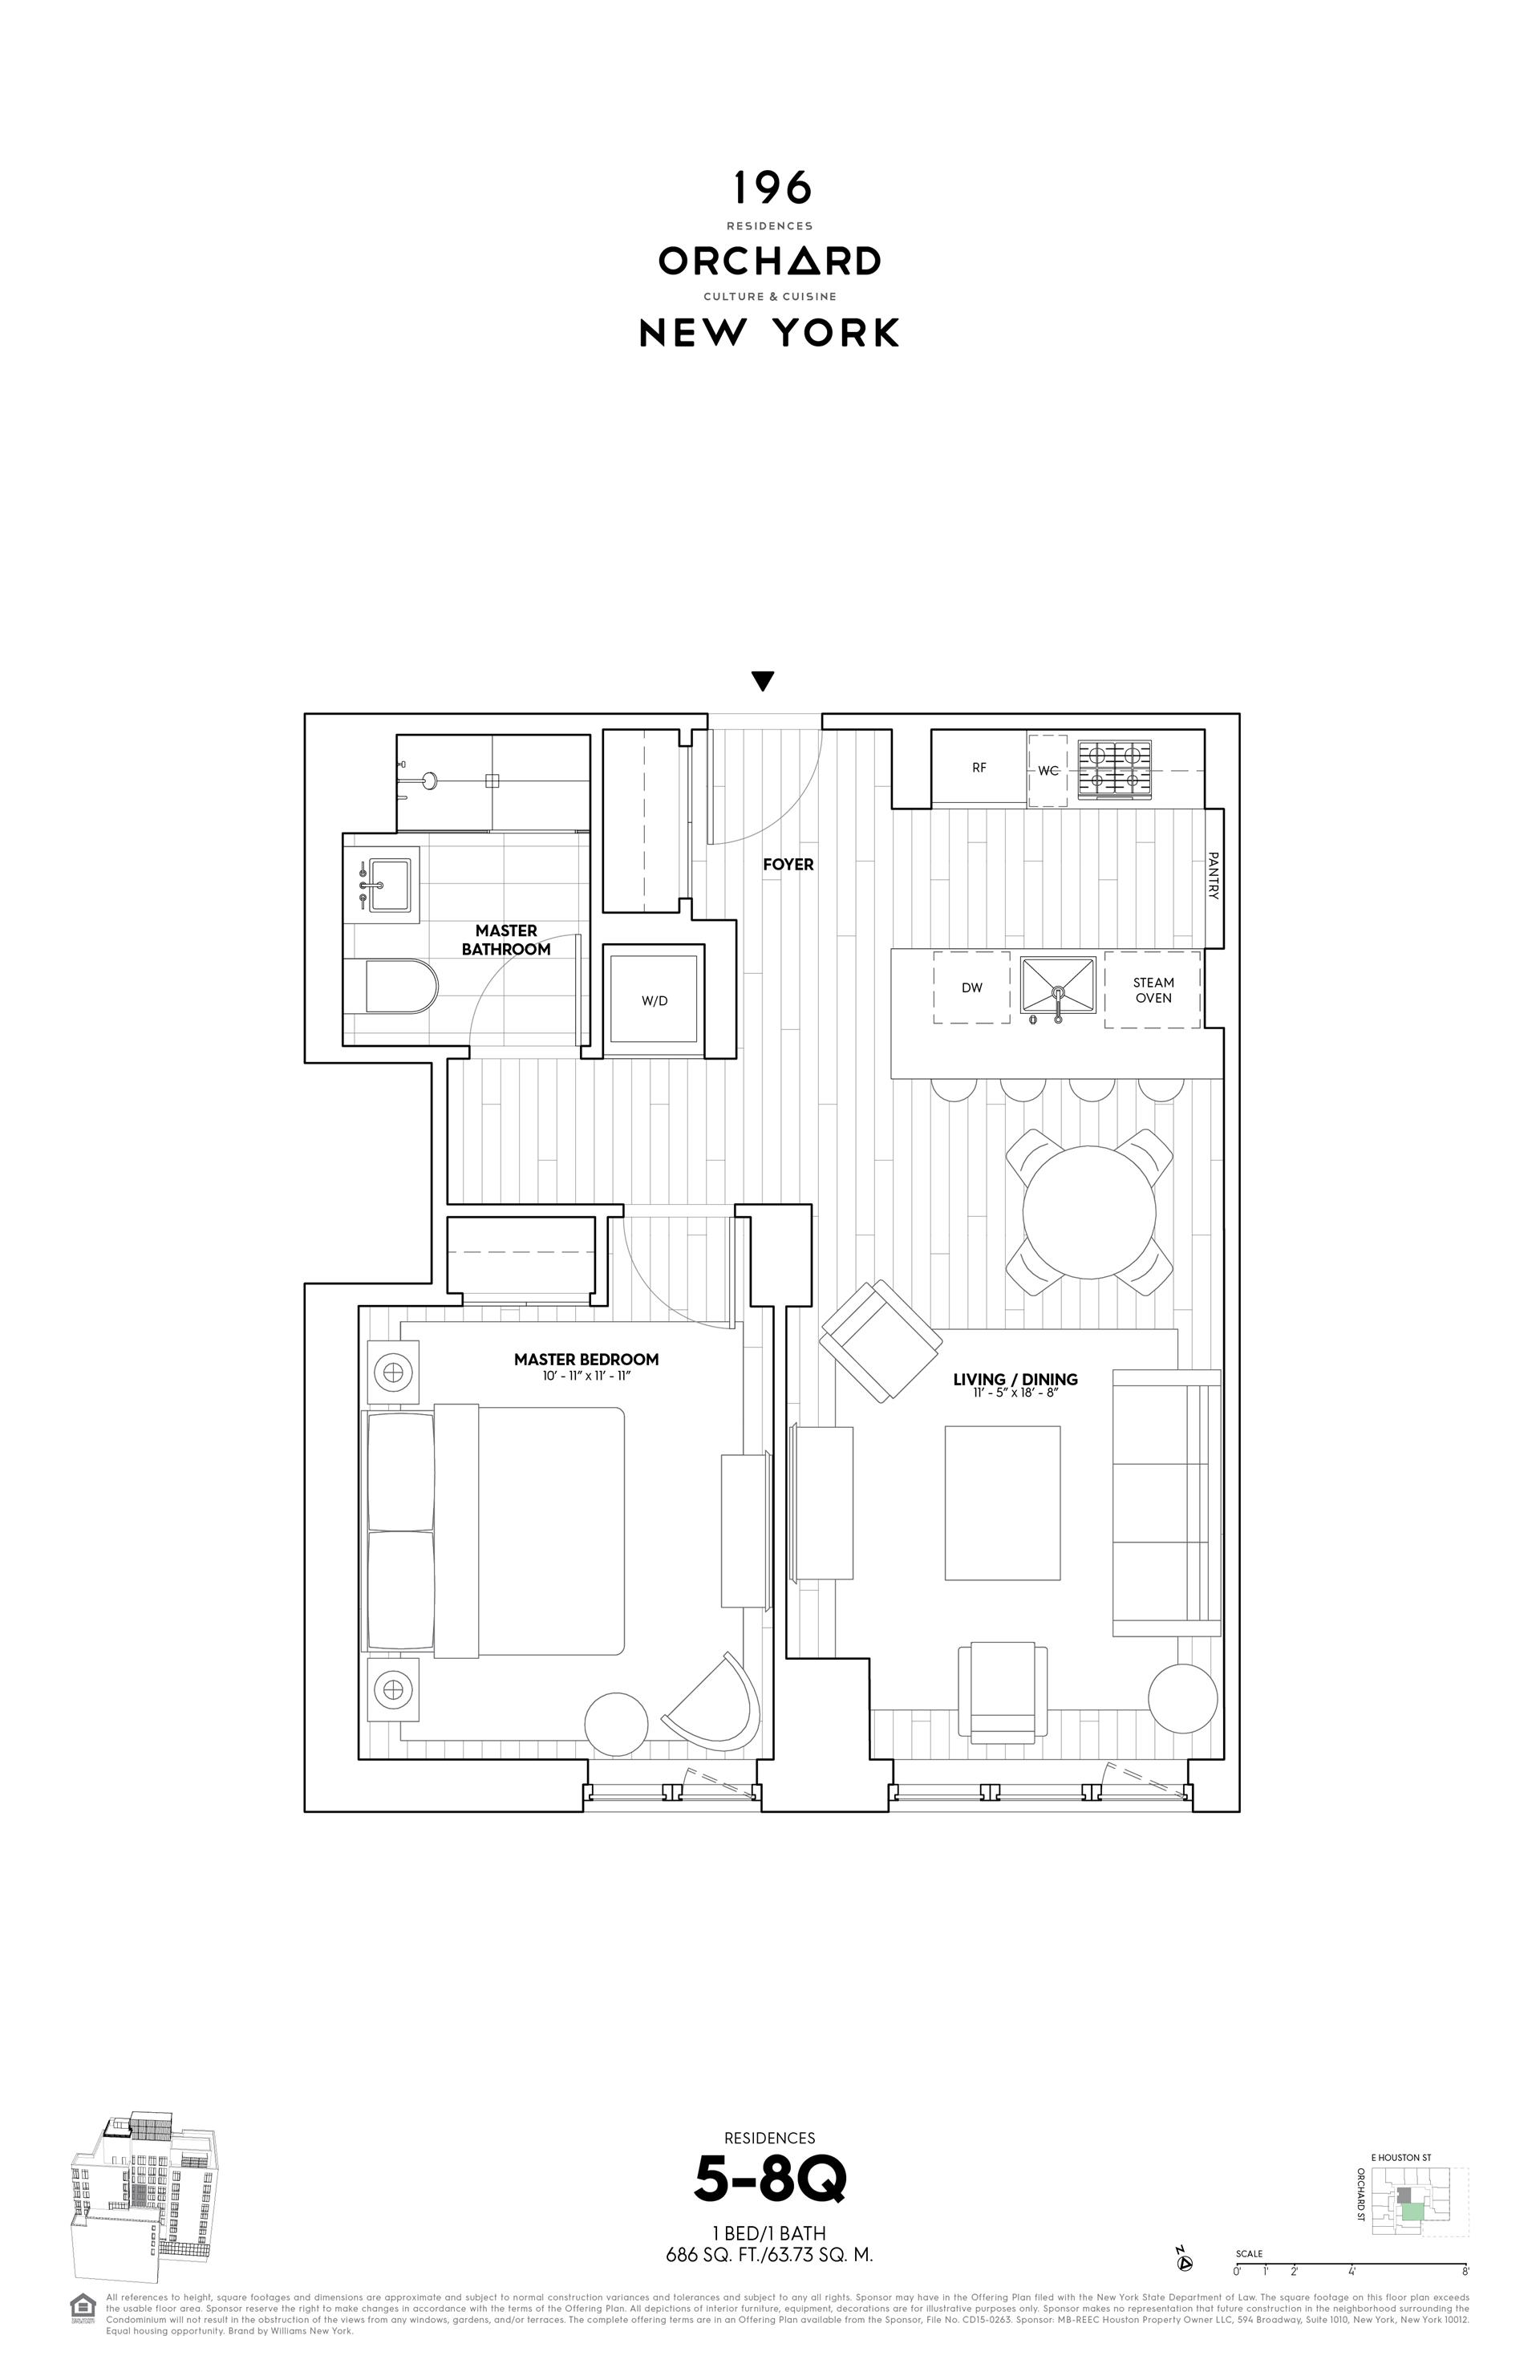 Floor plan of 196 Orchard Street, 8Q - Lower East Side, New York